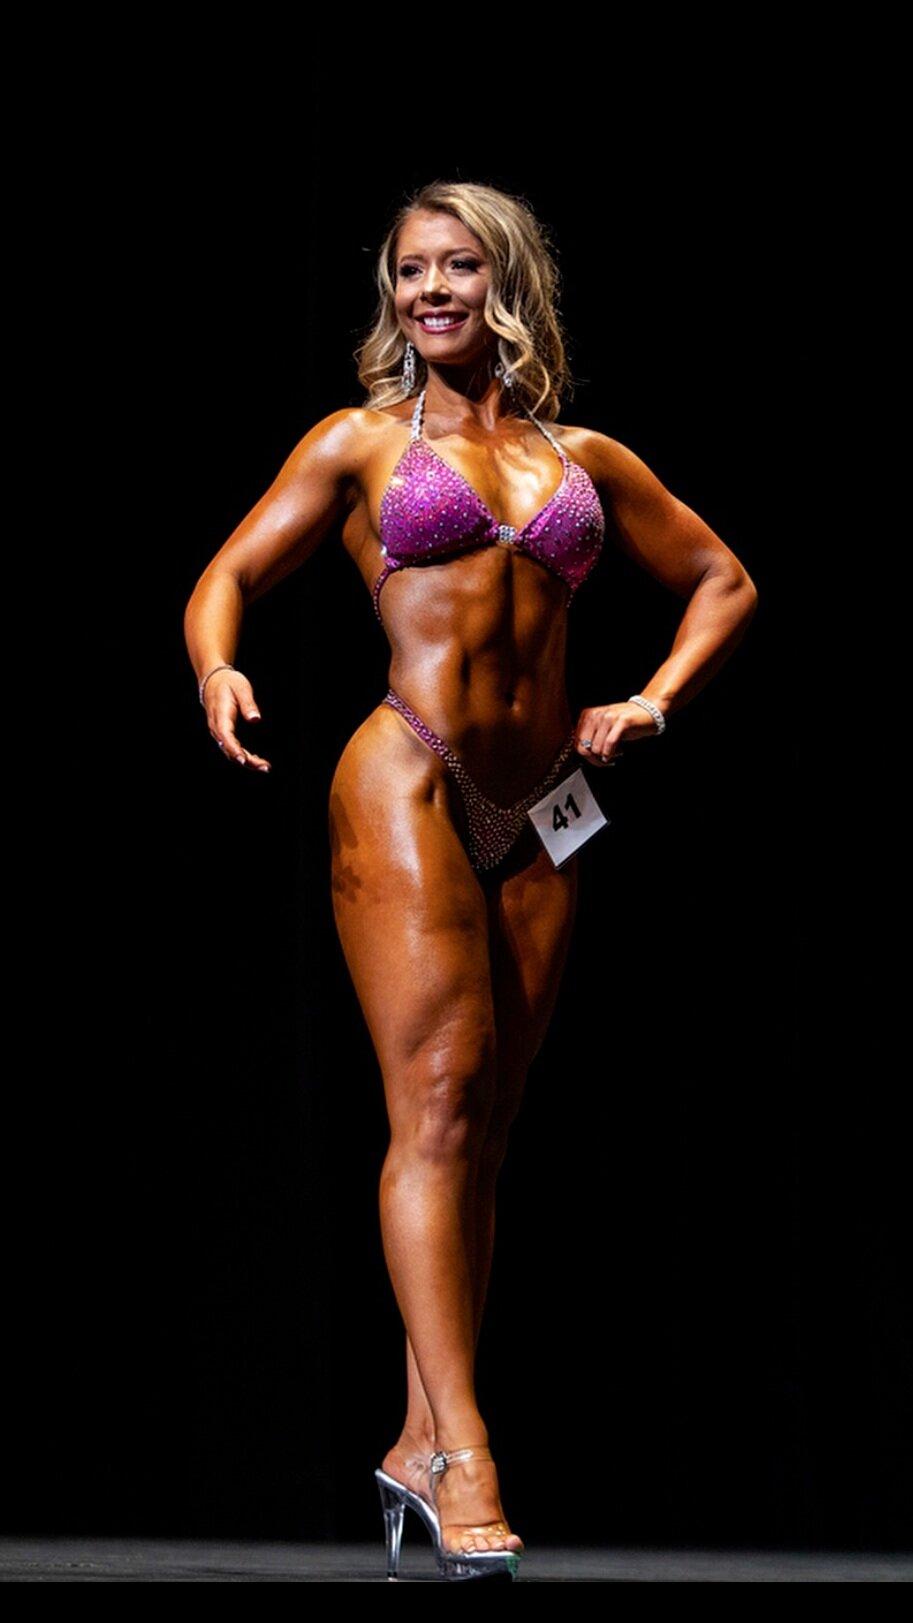 NATALIE ROBSON -